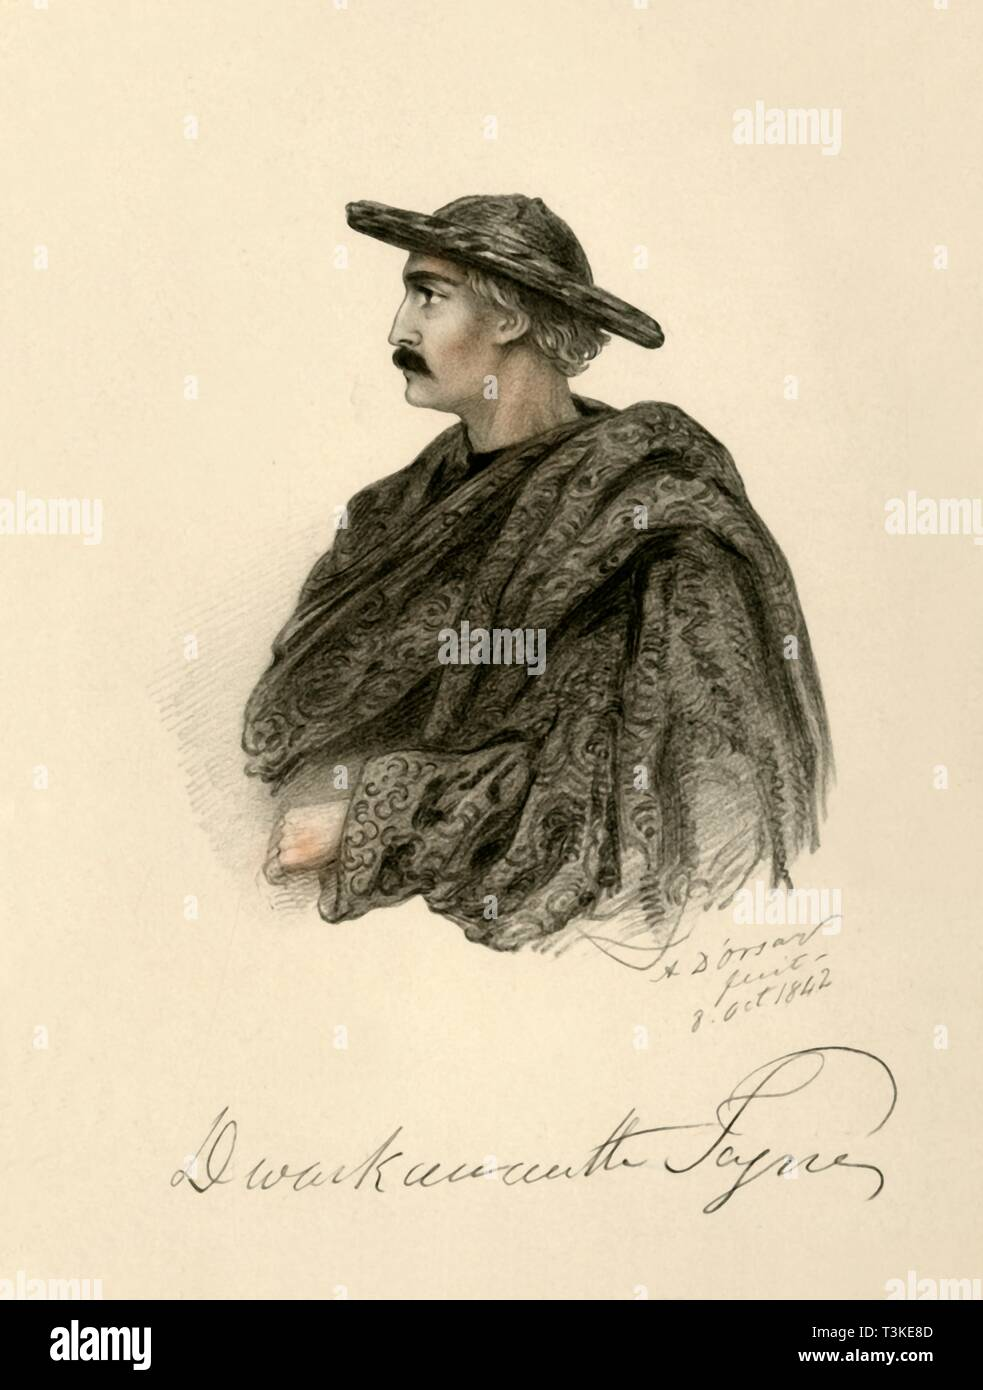 'Dwarkanath Tagore', 1842. Creator: Alfred d'Orsay. - Stock Image